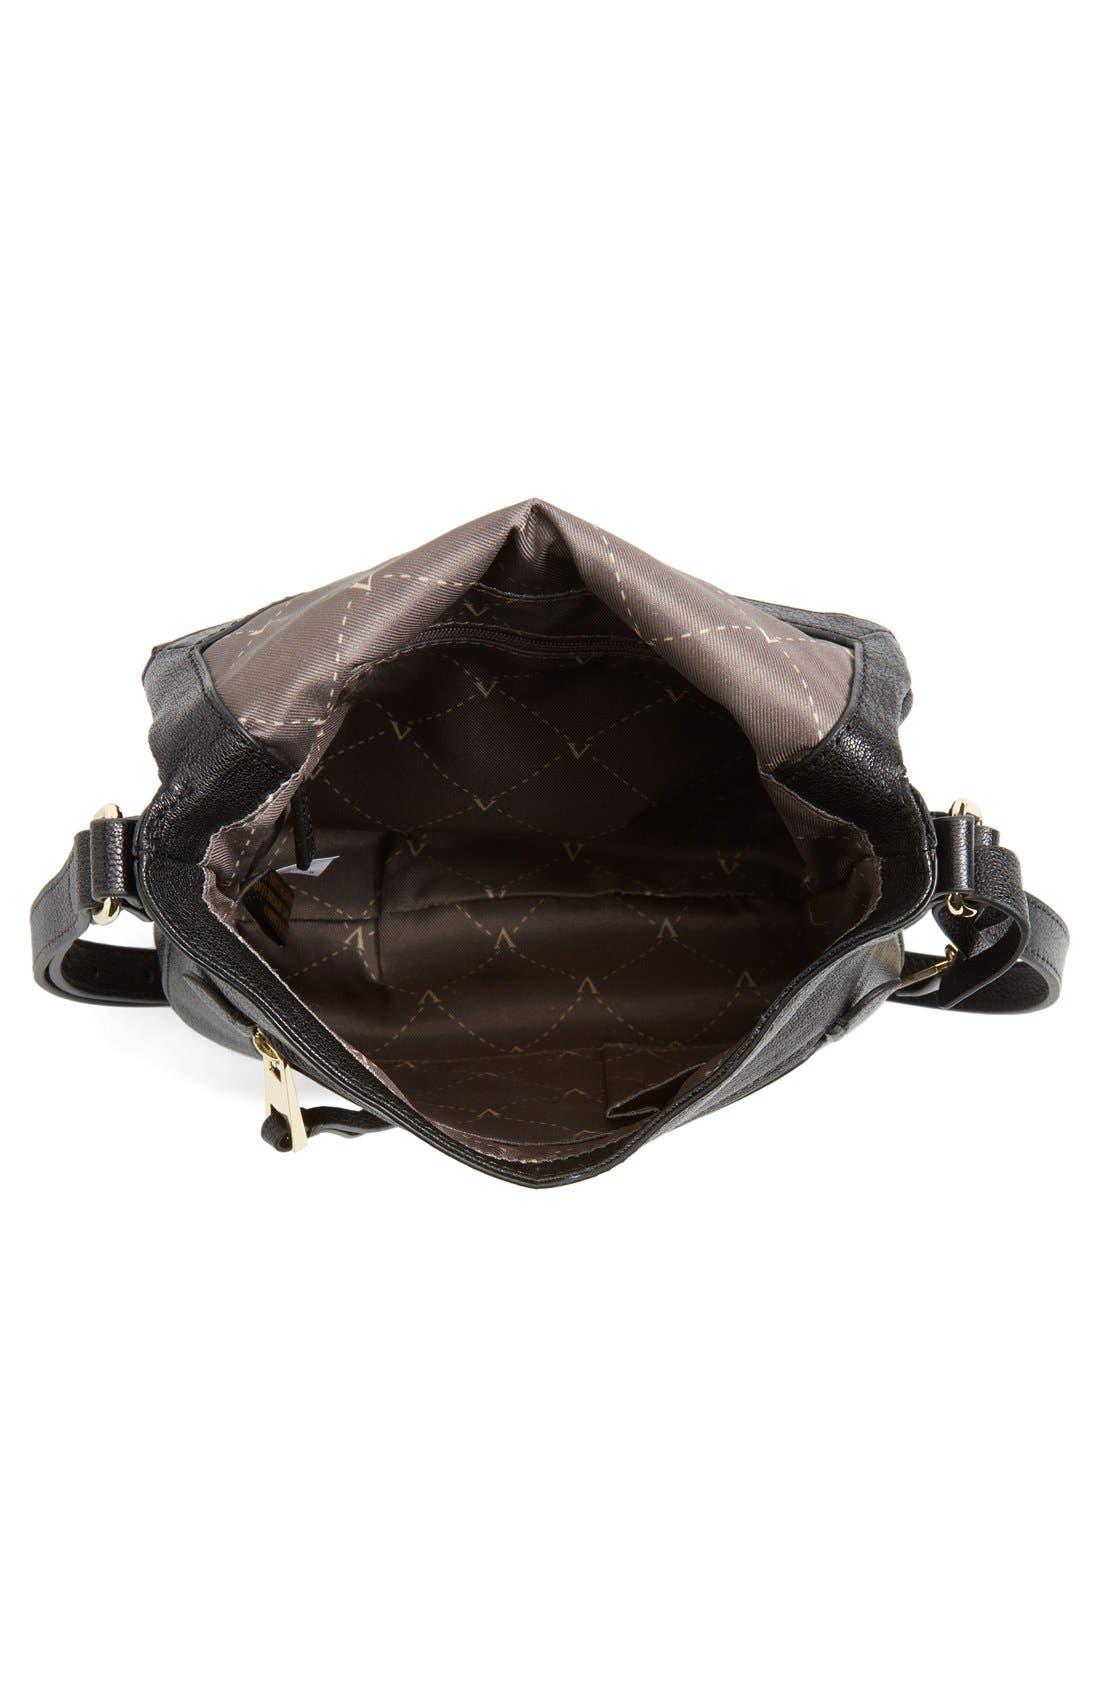 'Tala' Leather Crossbody Bag,                             Alternate thumbnail 5, color,                             001